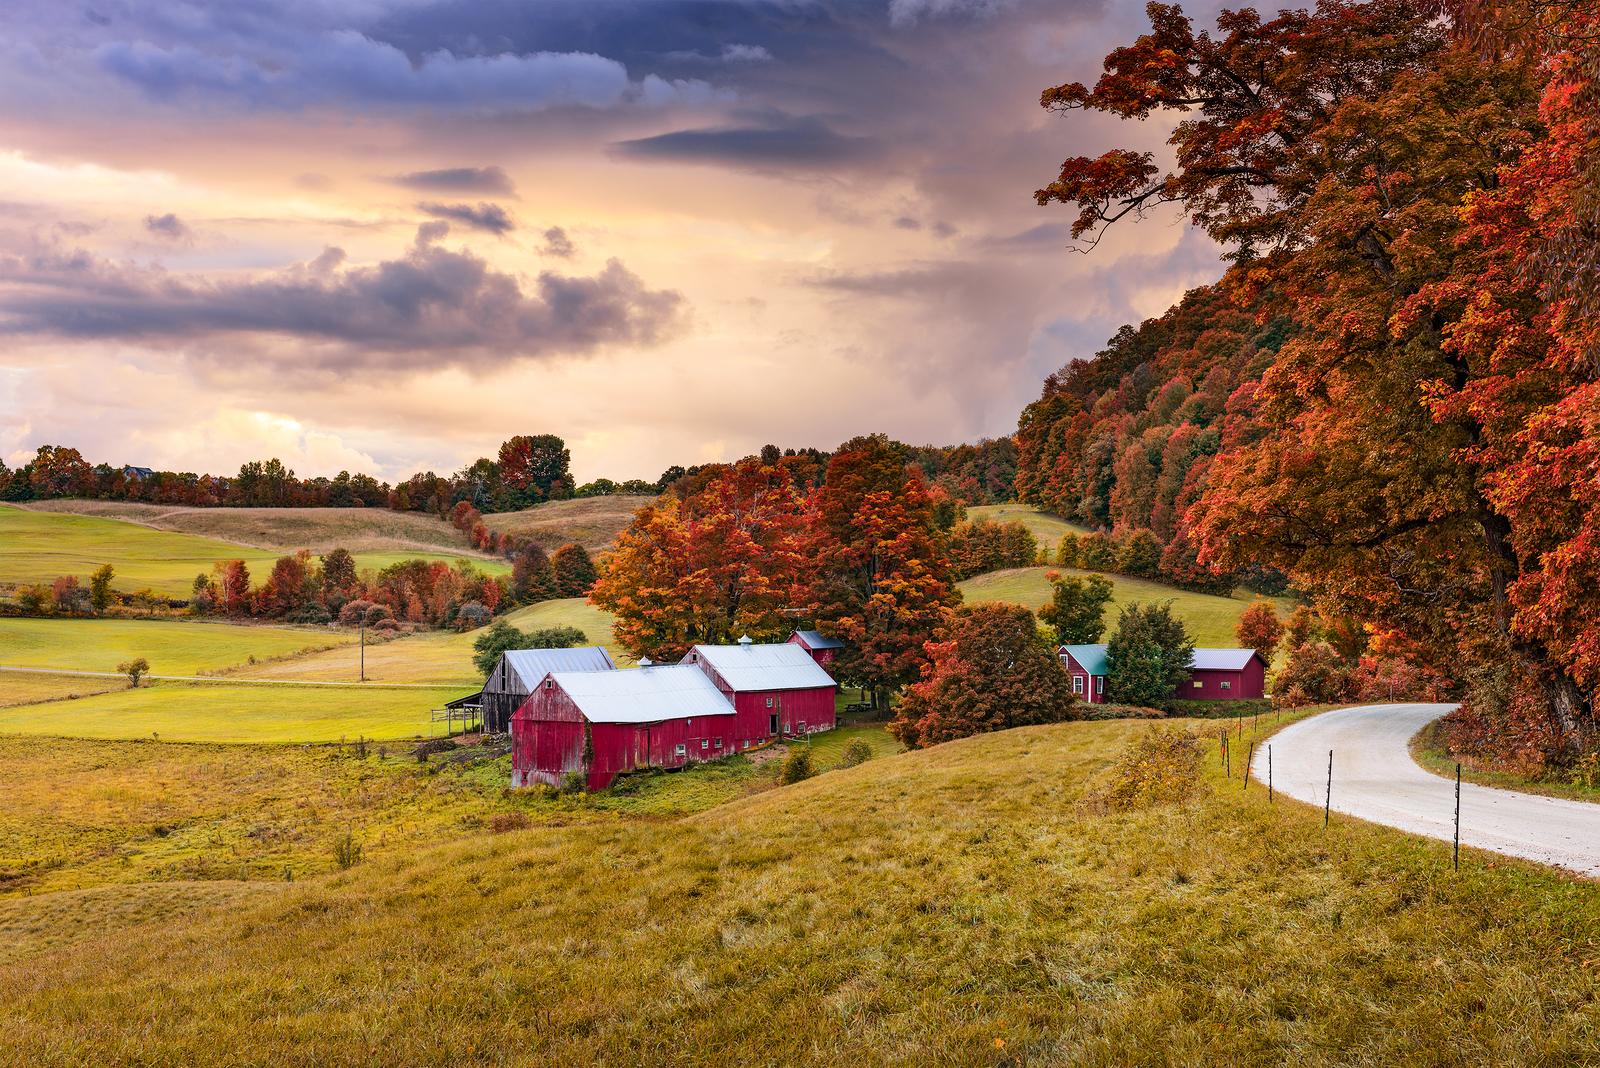 Vermont Fall Farm Wallpaper Seneca Farms Penn Yan Ny American Restaurant And Ice